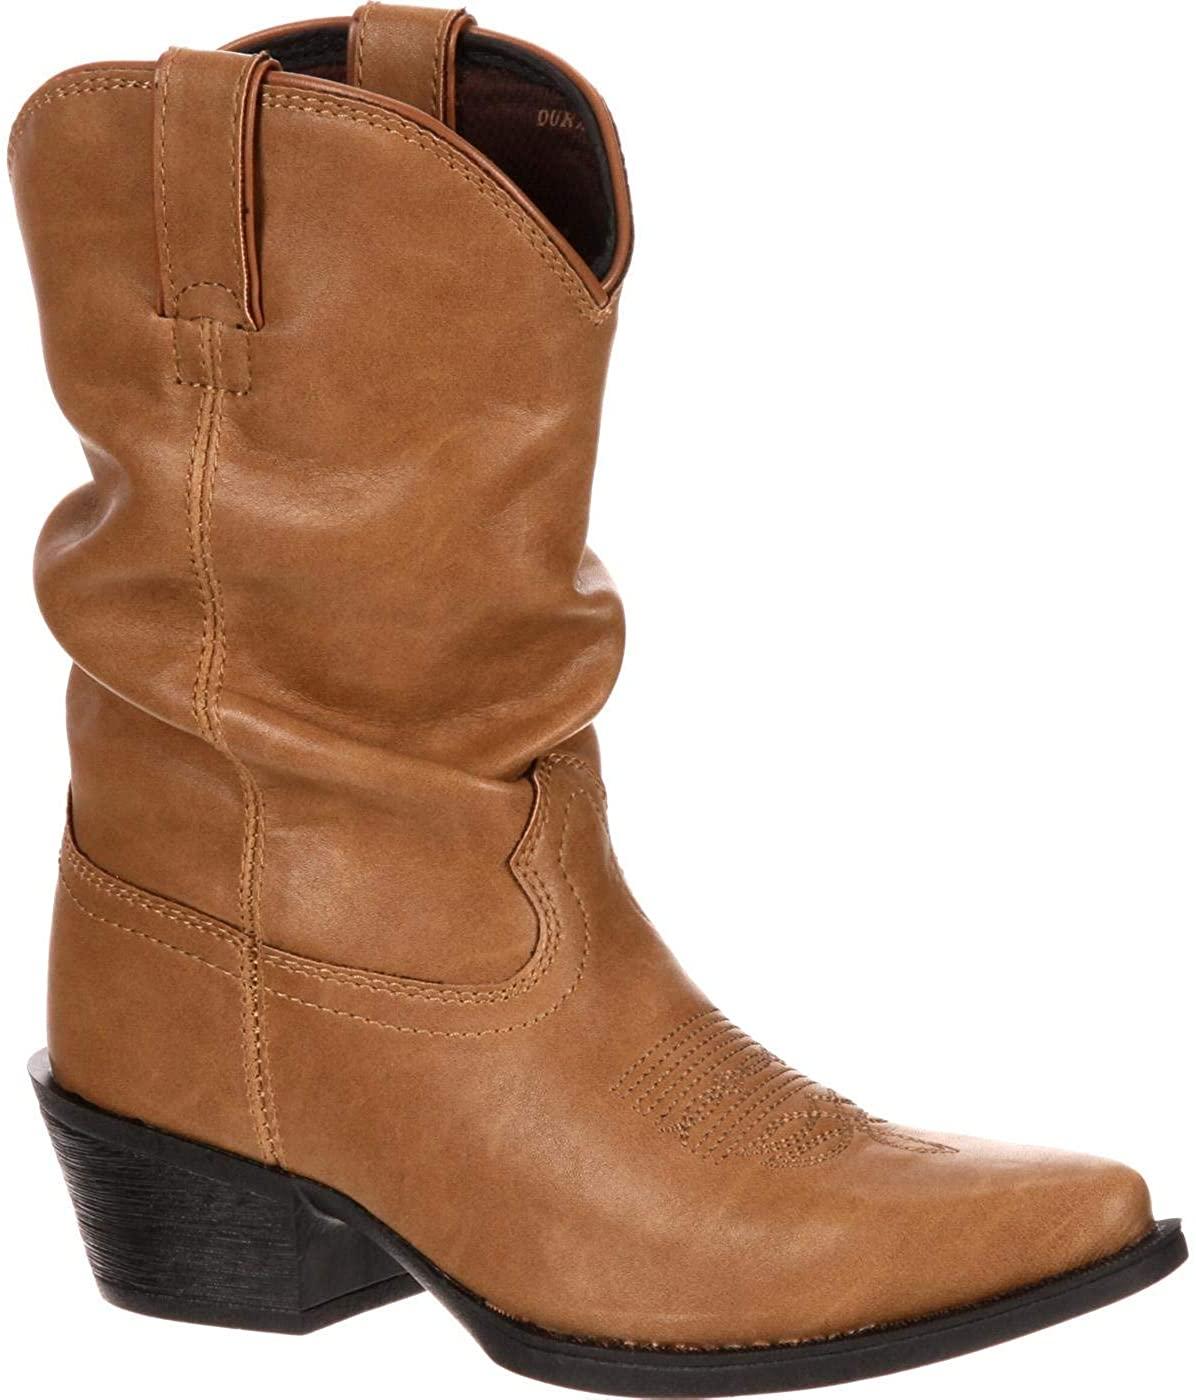 Durango Lil Big Kid Western Slouch Boot